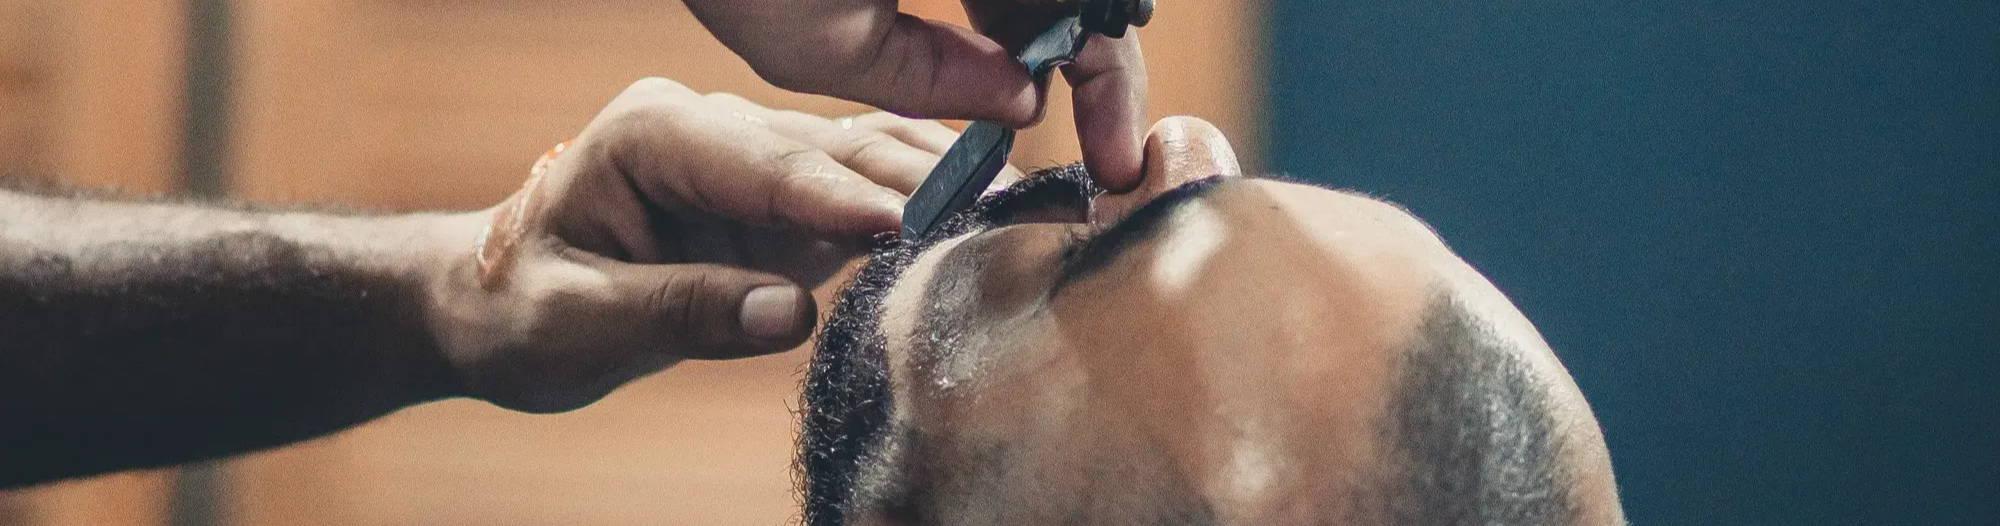 rasiermesser beim rasieren im barbershop